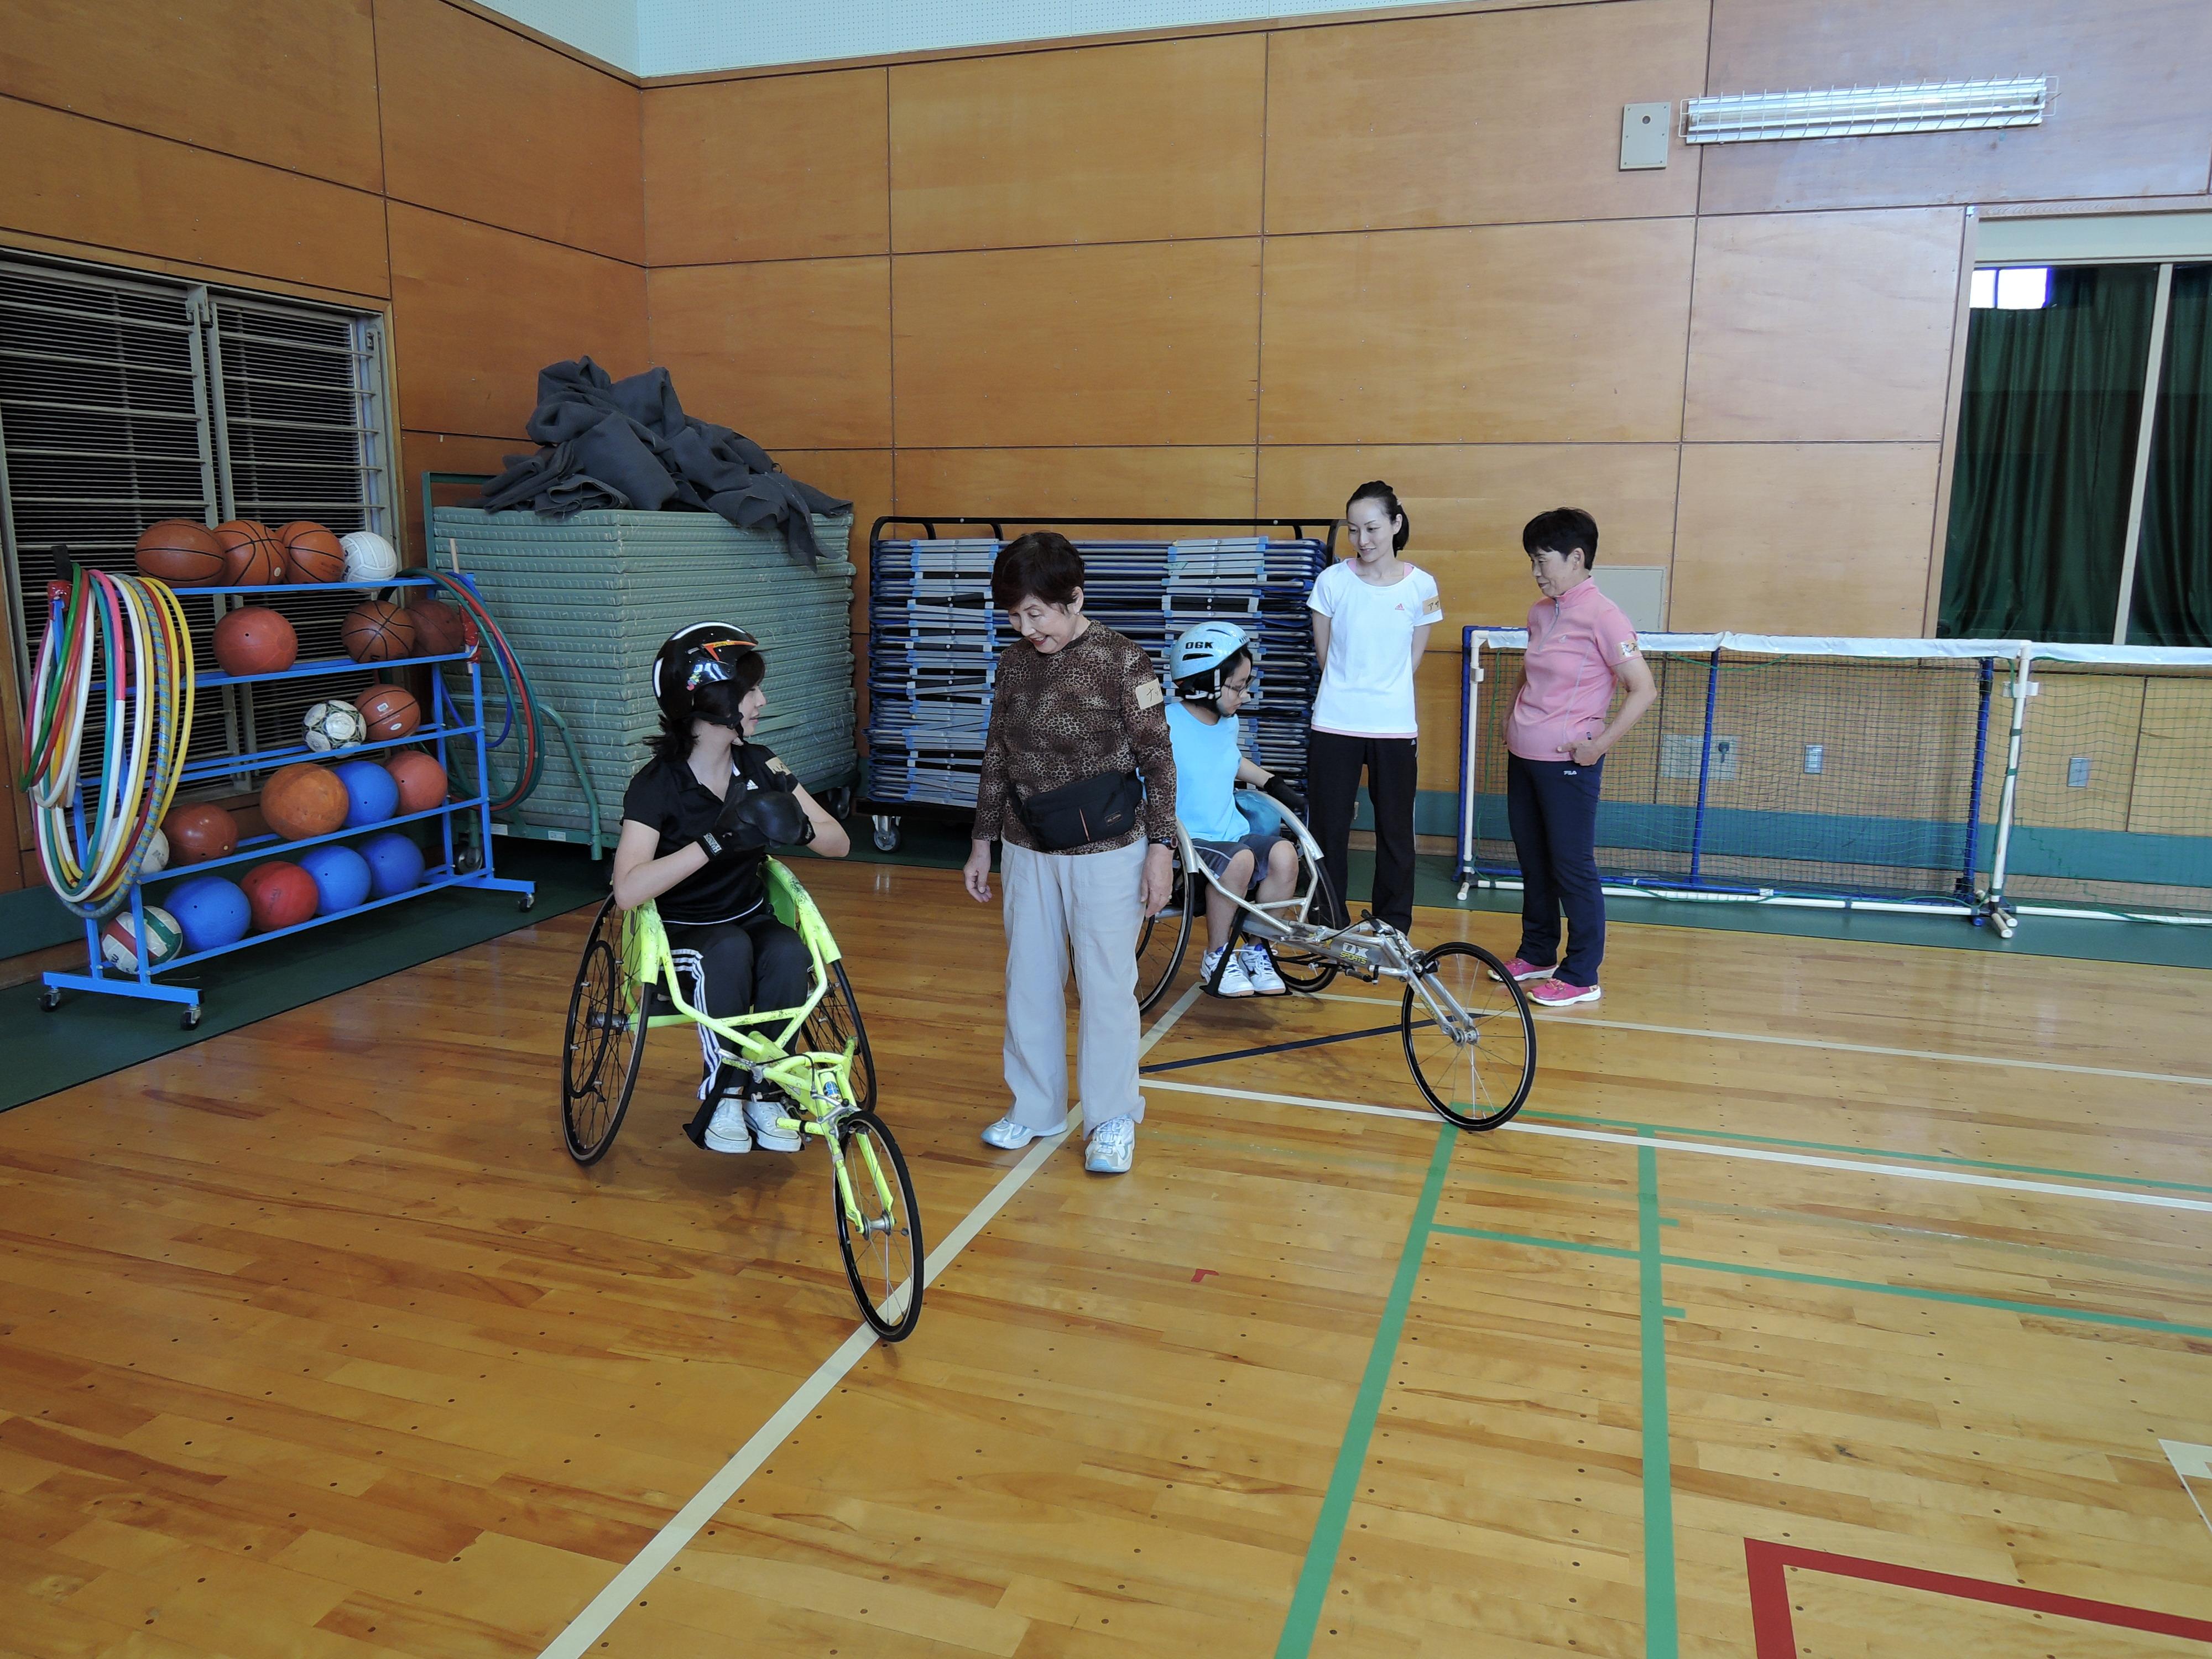 DSCN7092 - スポーツボランティア入門講習会「スポーツ用車いすに乗ってみよう!」